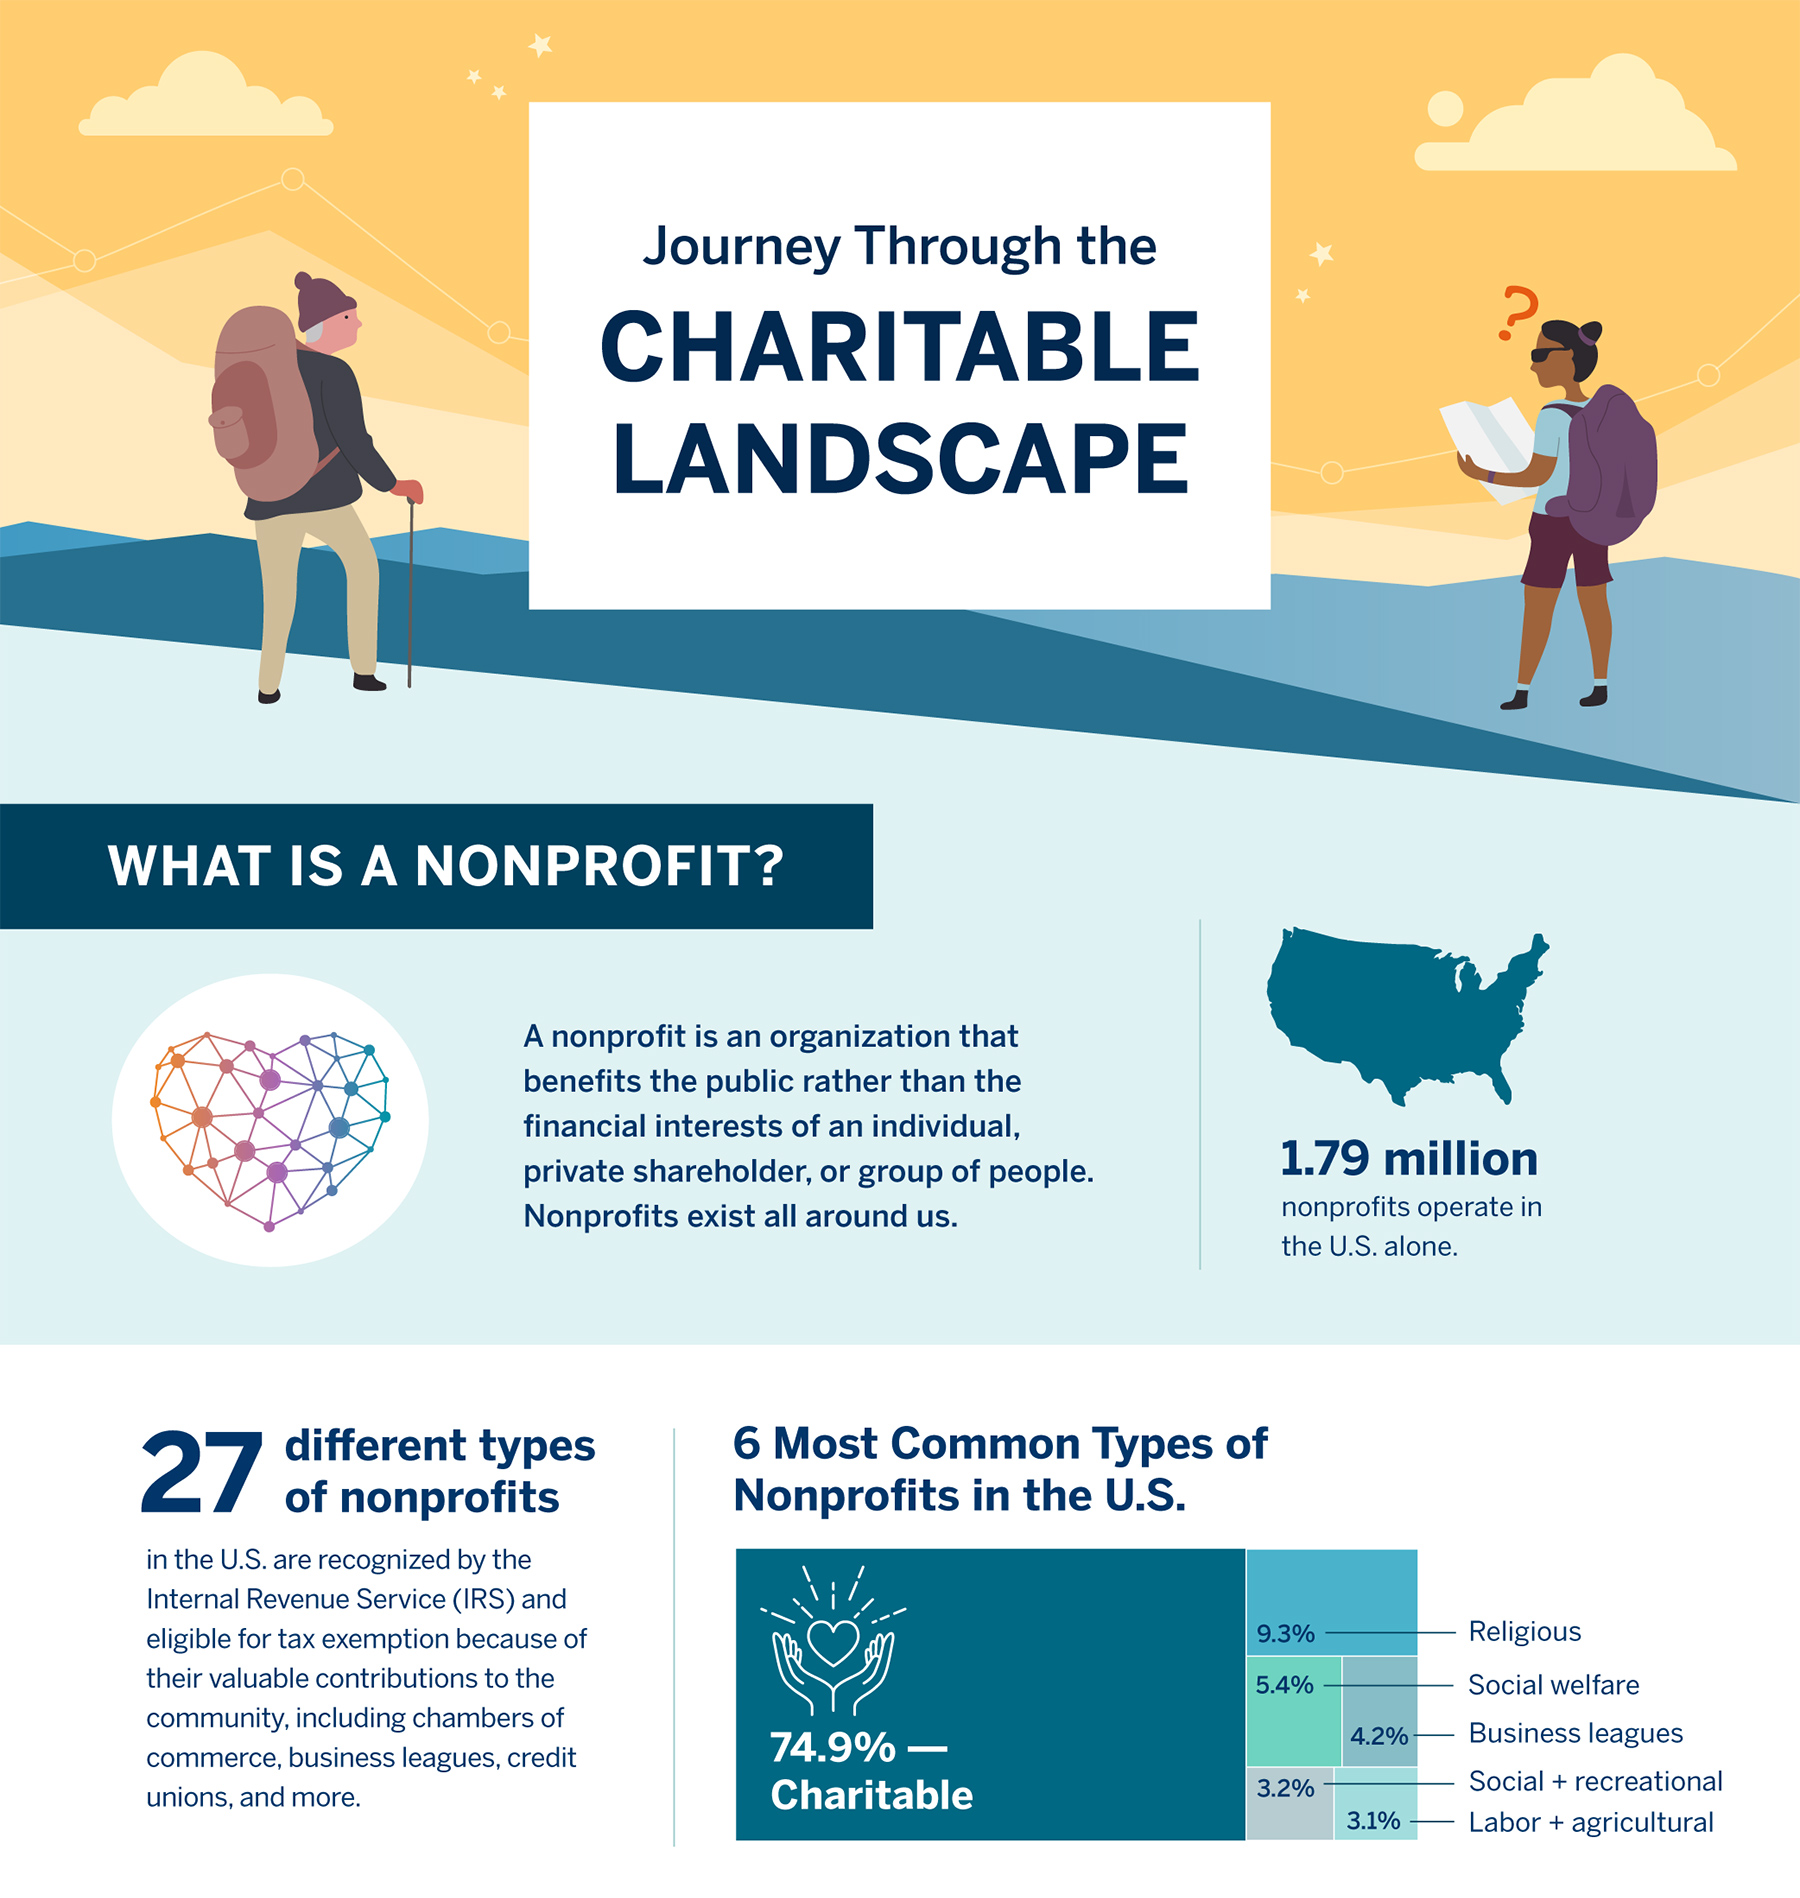 CharitableLandscapeInfographic_slice1